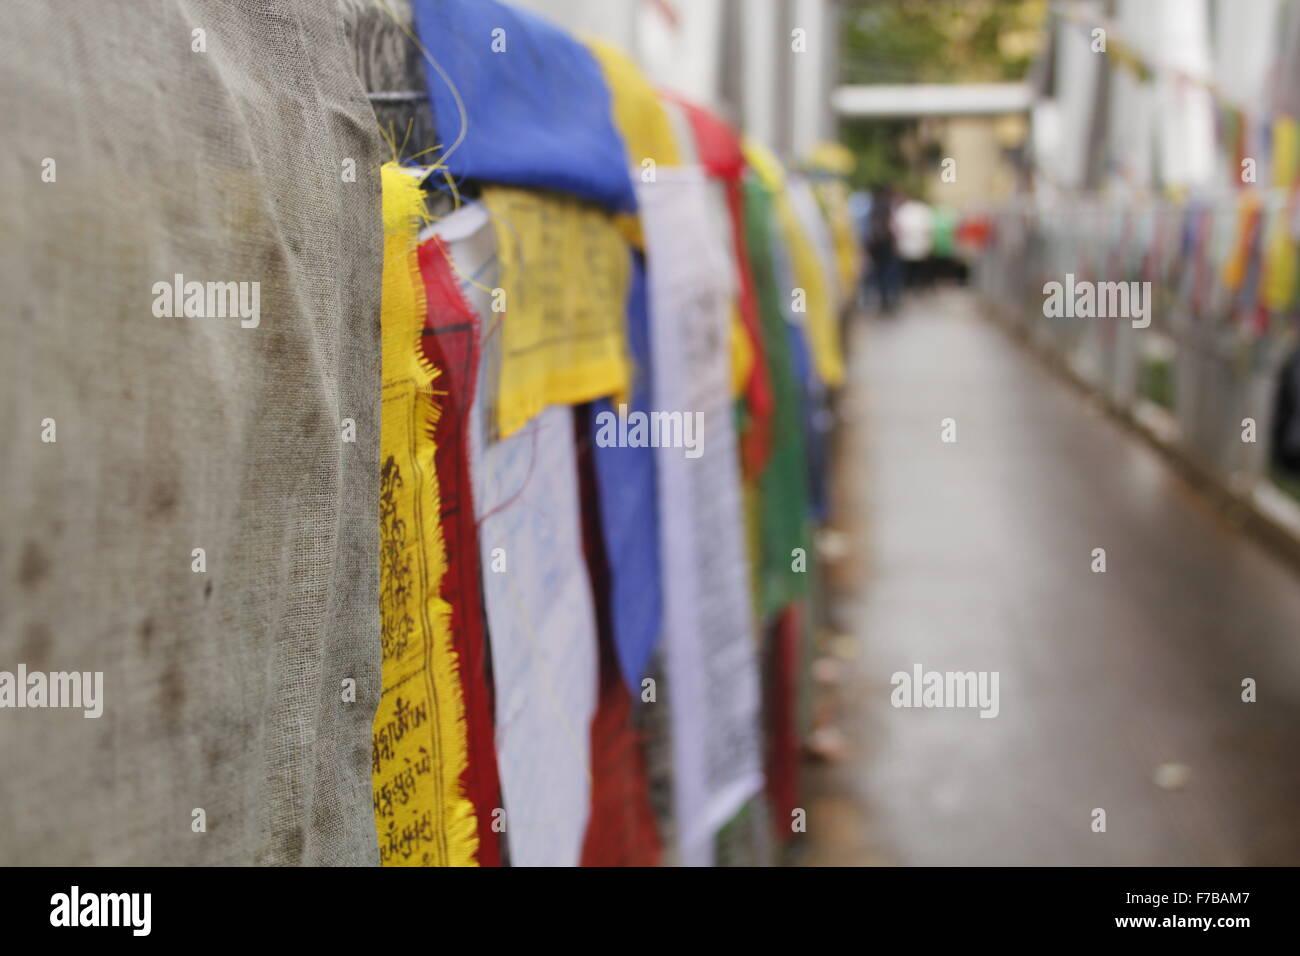 Prayer Flags-Bhutan - Stock Image